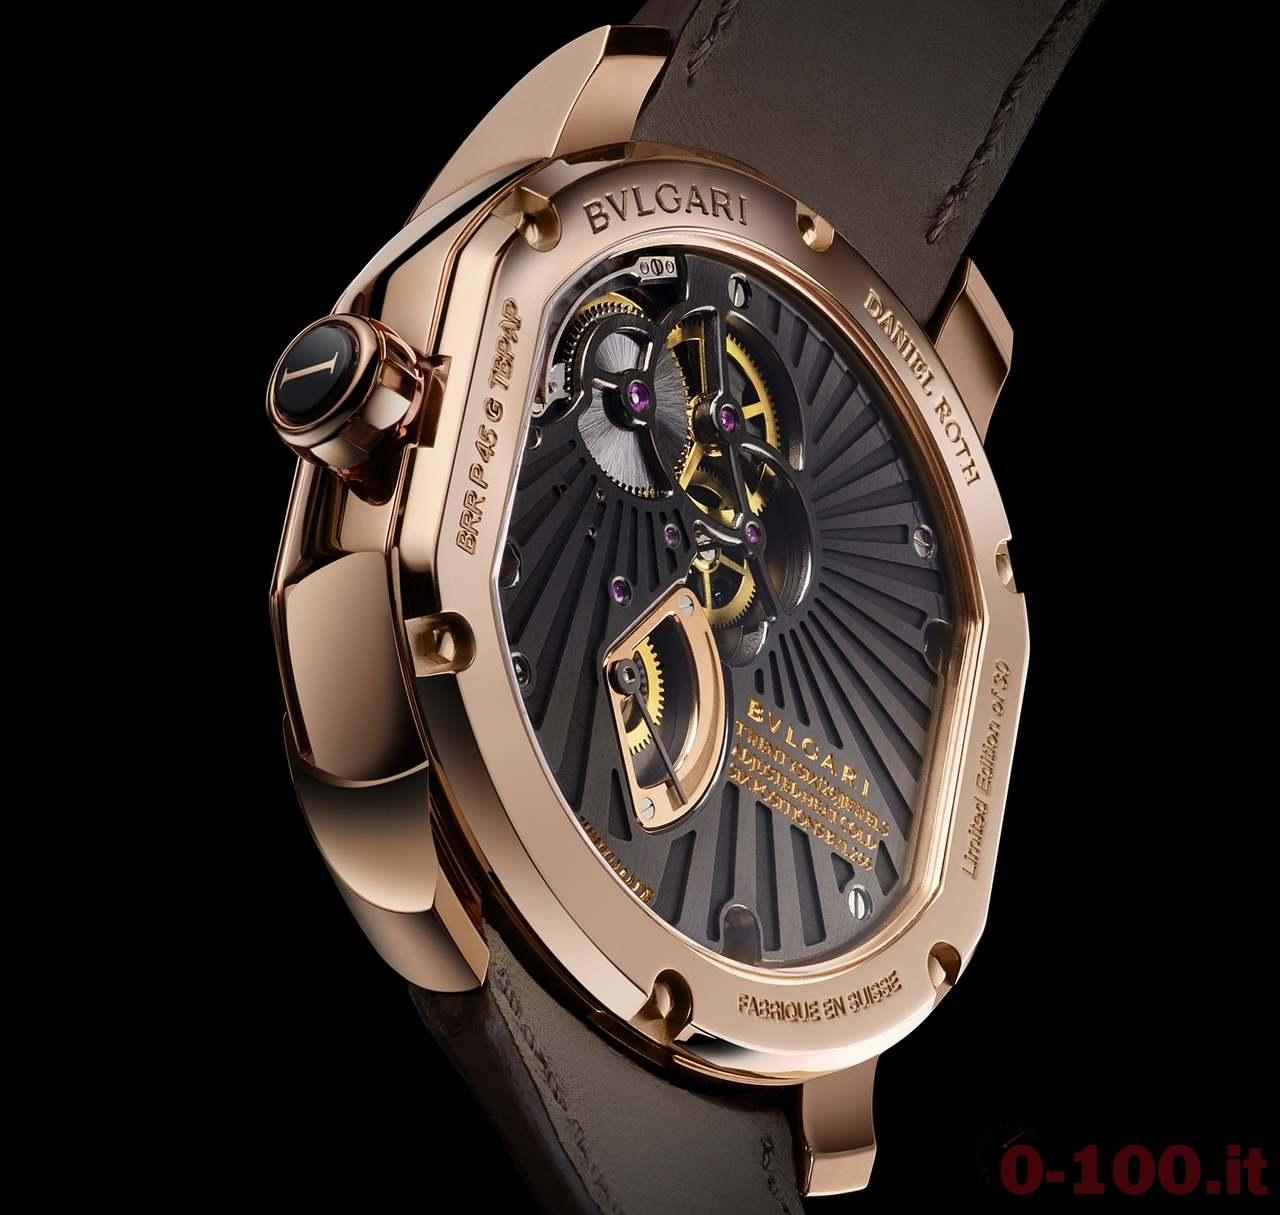 bulgari-papillon-with-central-flying-tourbillon-limited-edition-prezzo-price_0-1003